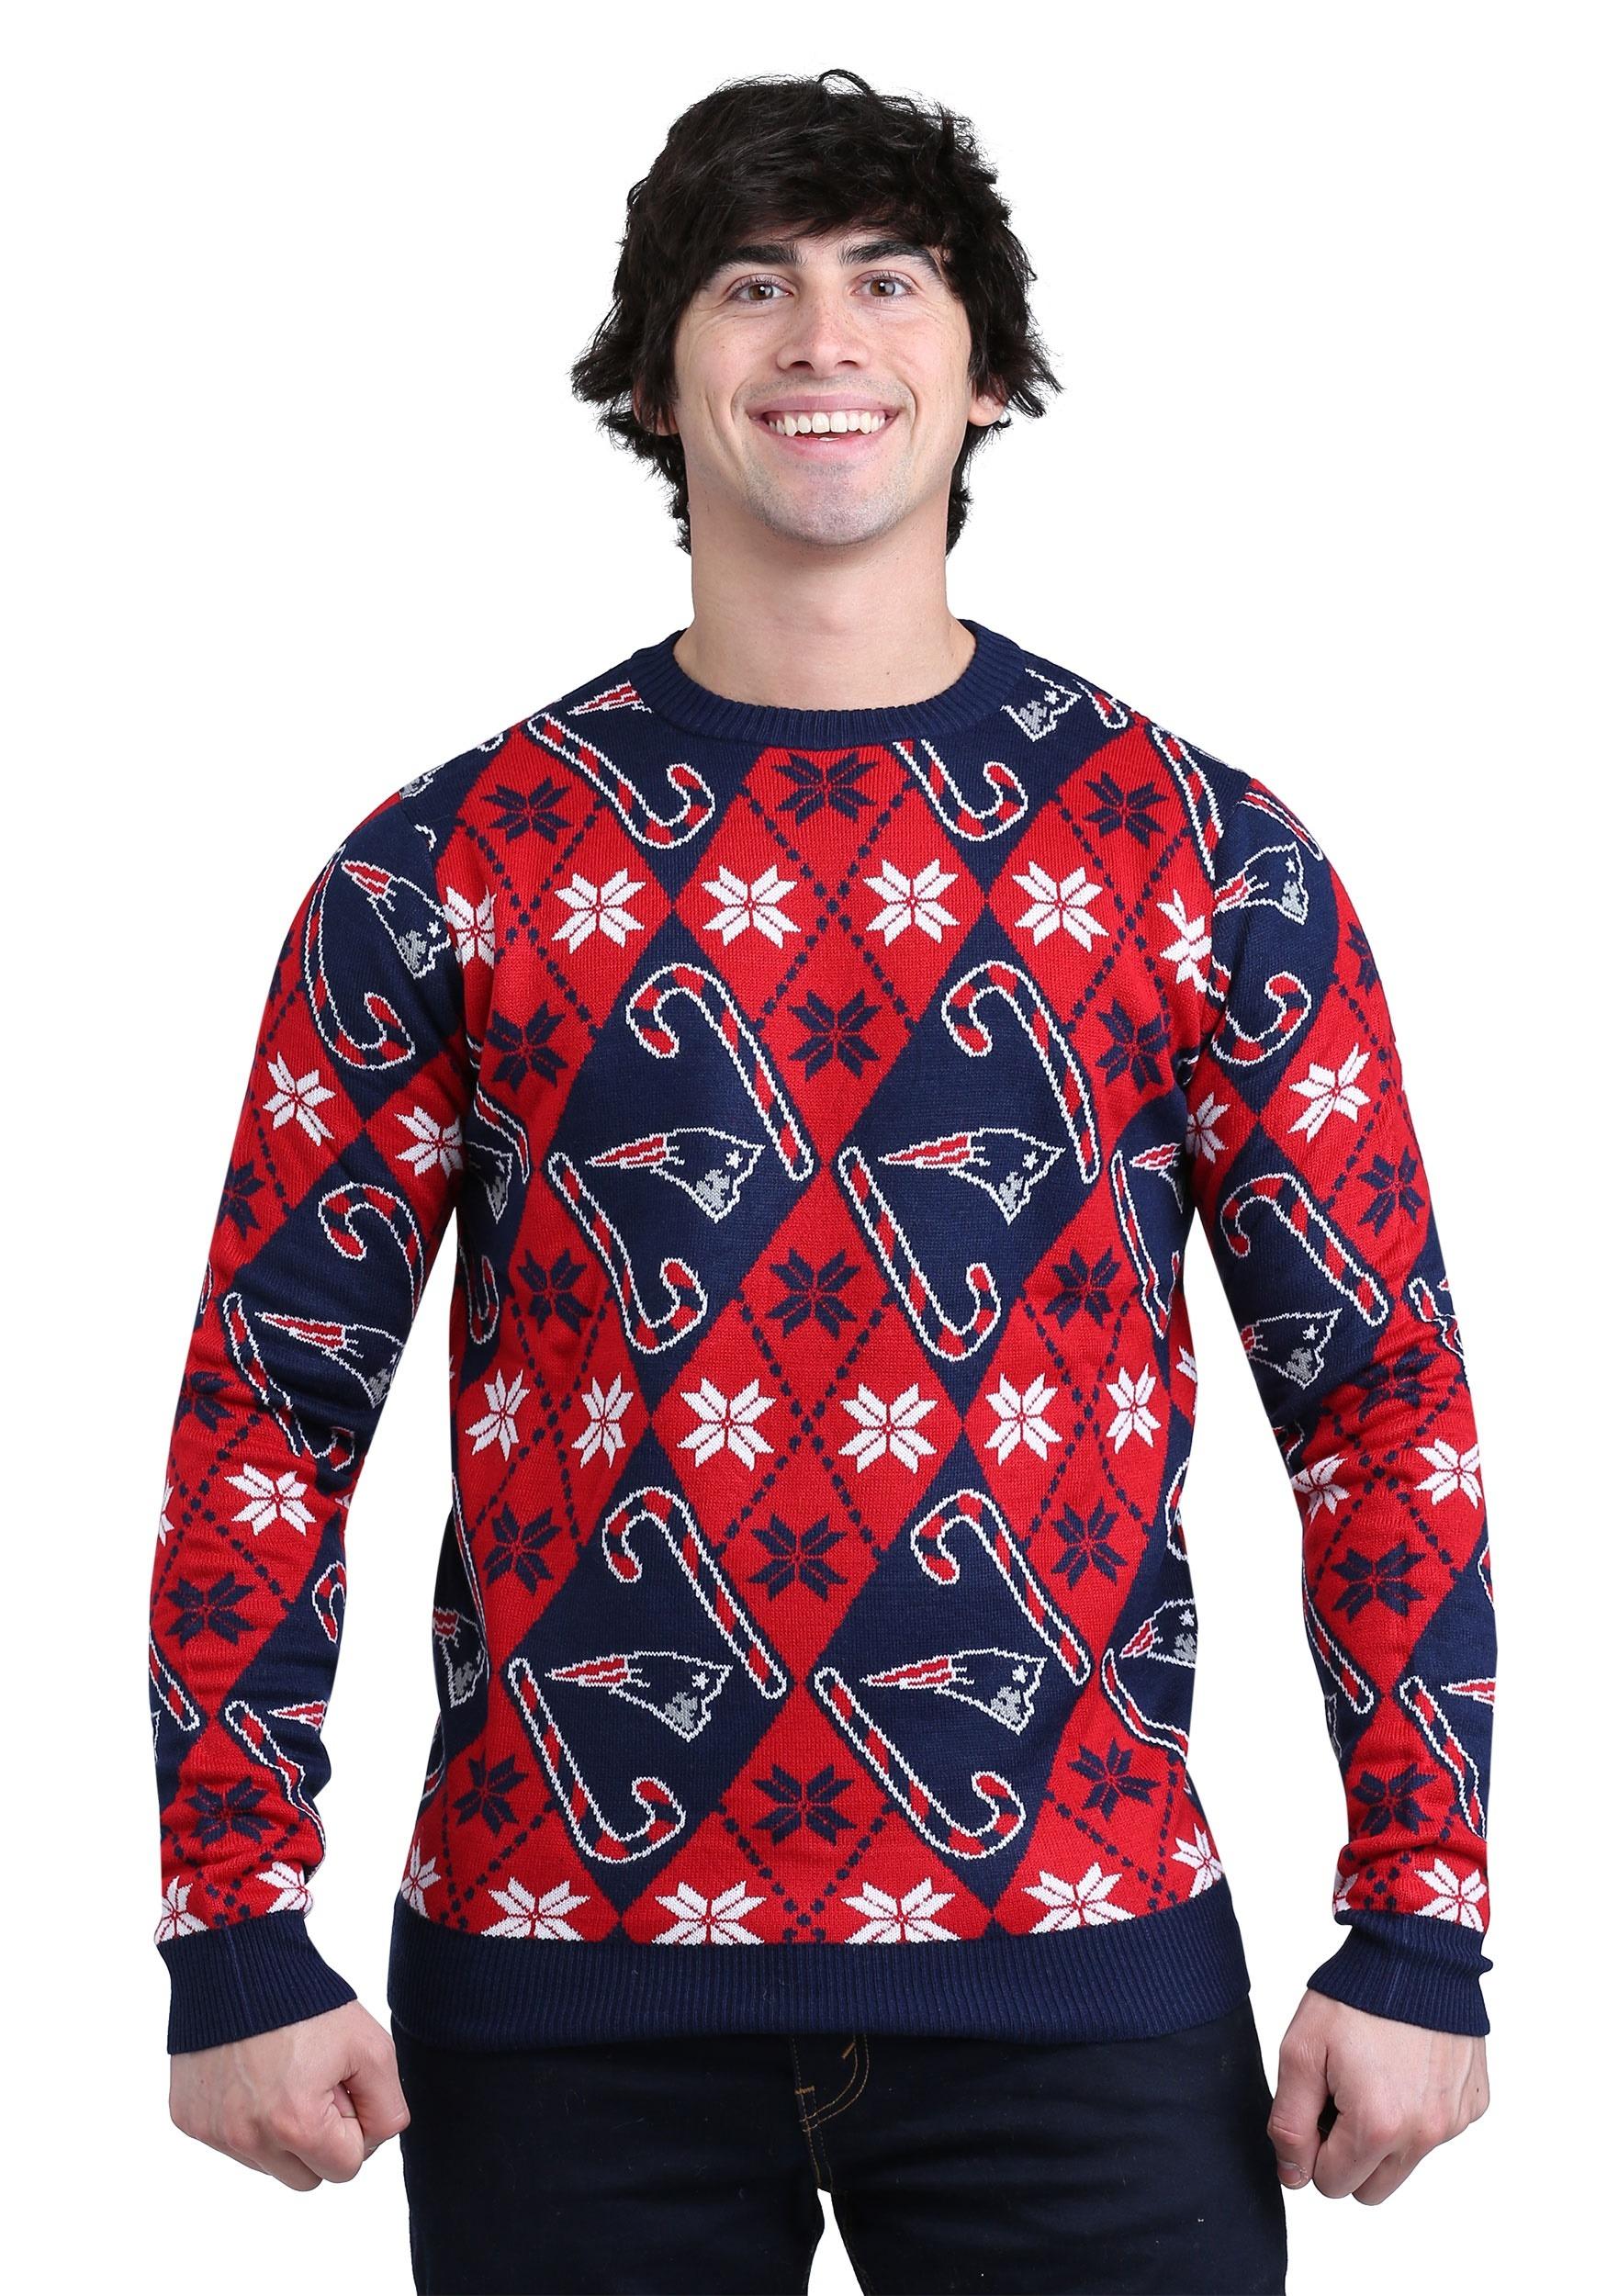 buy popular 4d5c1 67345 New England Patriots Gifts & Merchandise for Men and Women